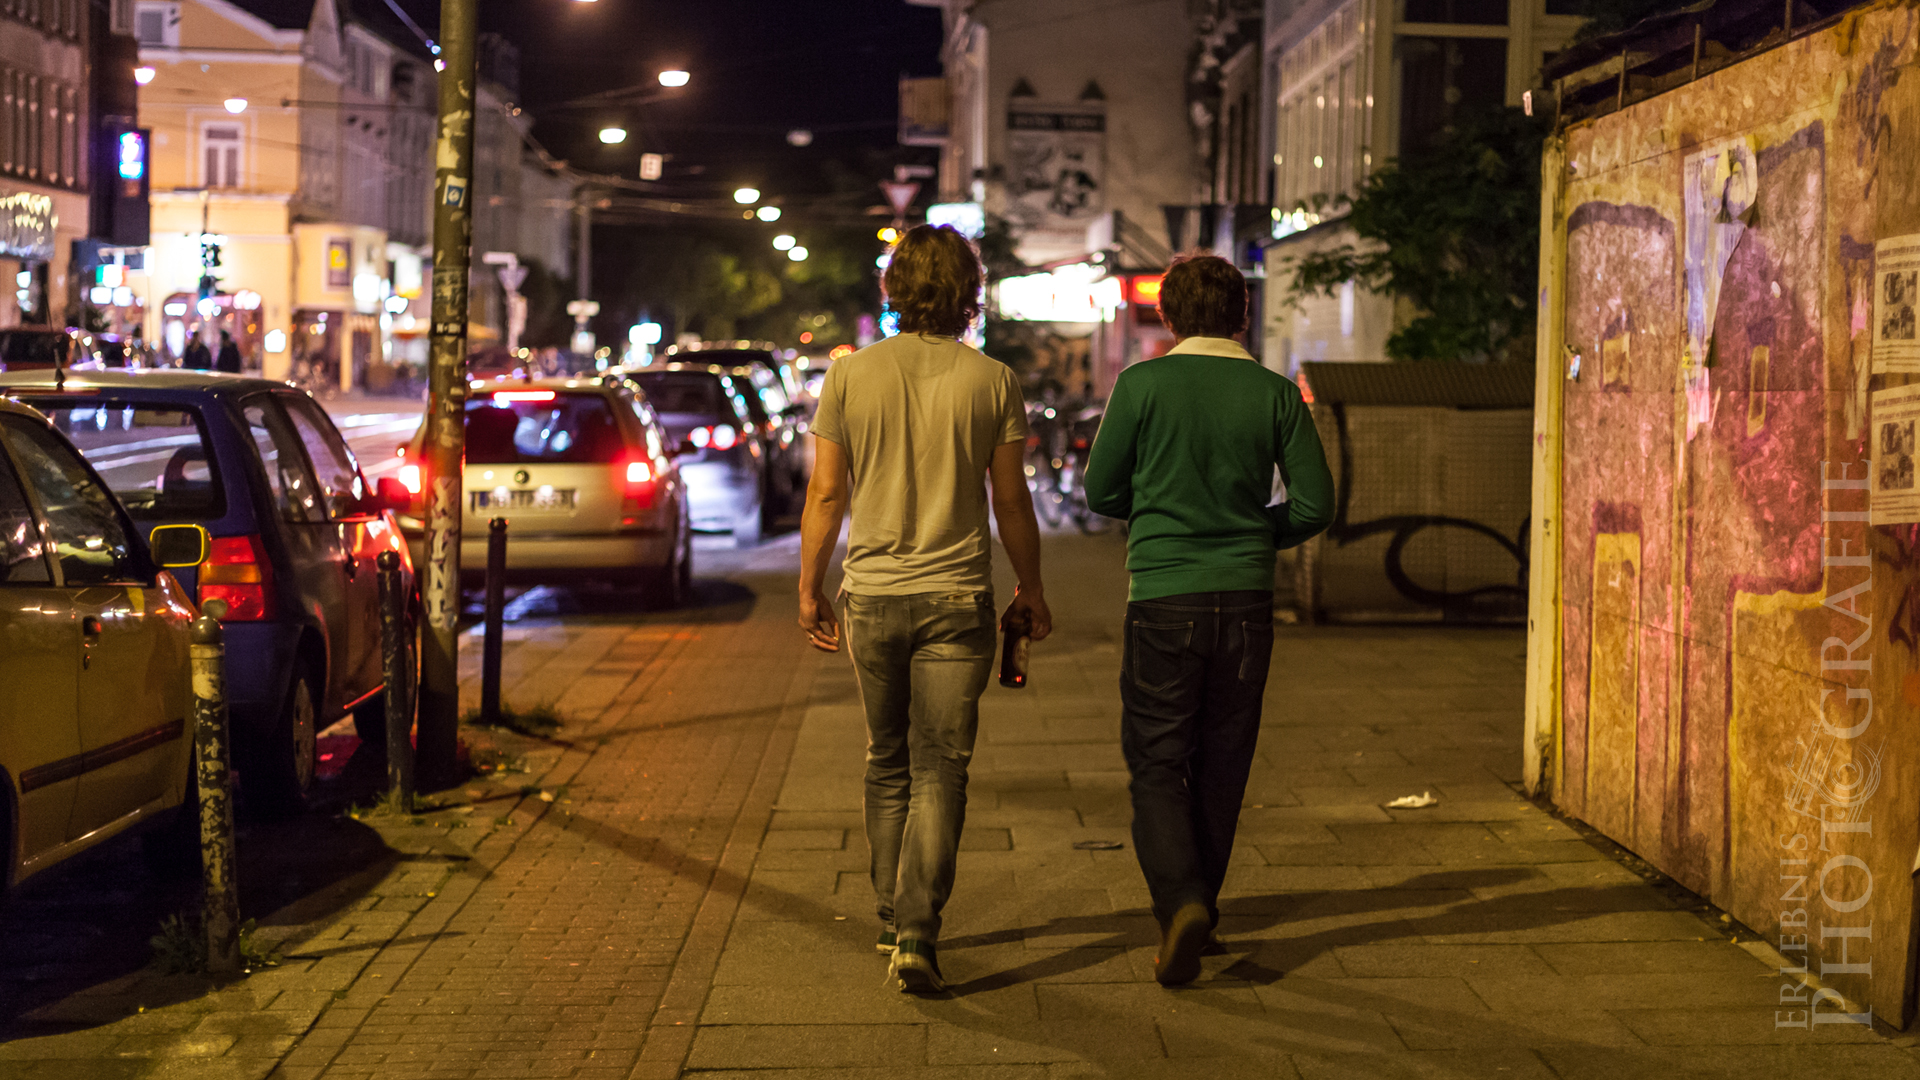 Fotostudio, Fotograf, Bremen, Streetphotography, Straßenfotografie